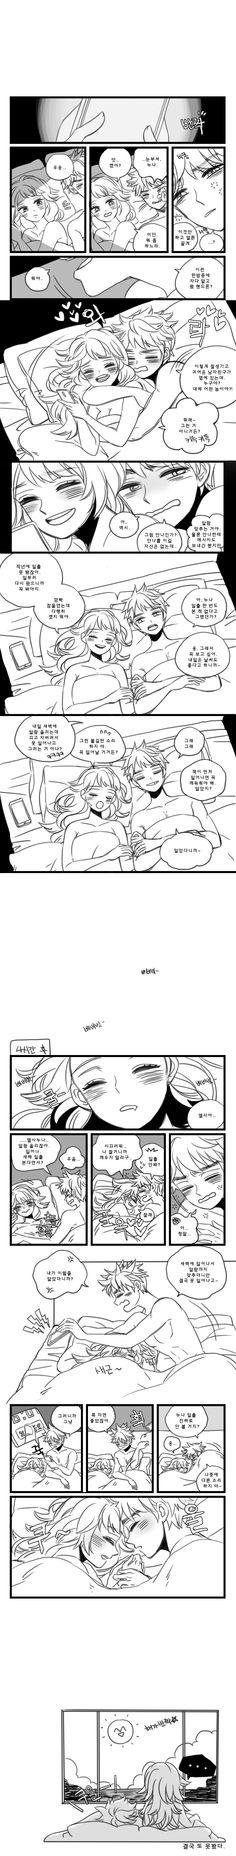 Jelsa: Sleeping in ❄️☀️